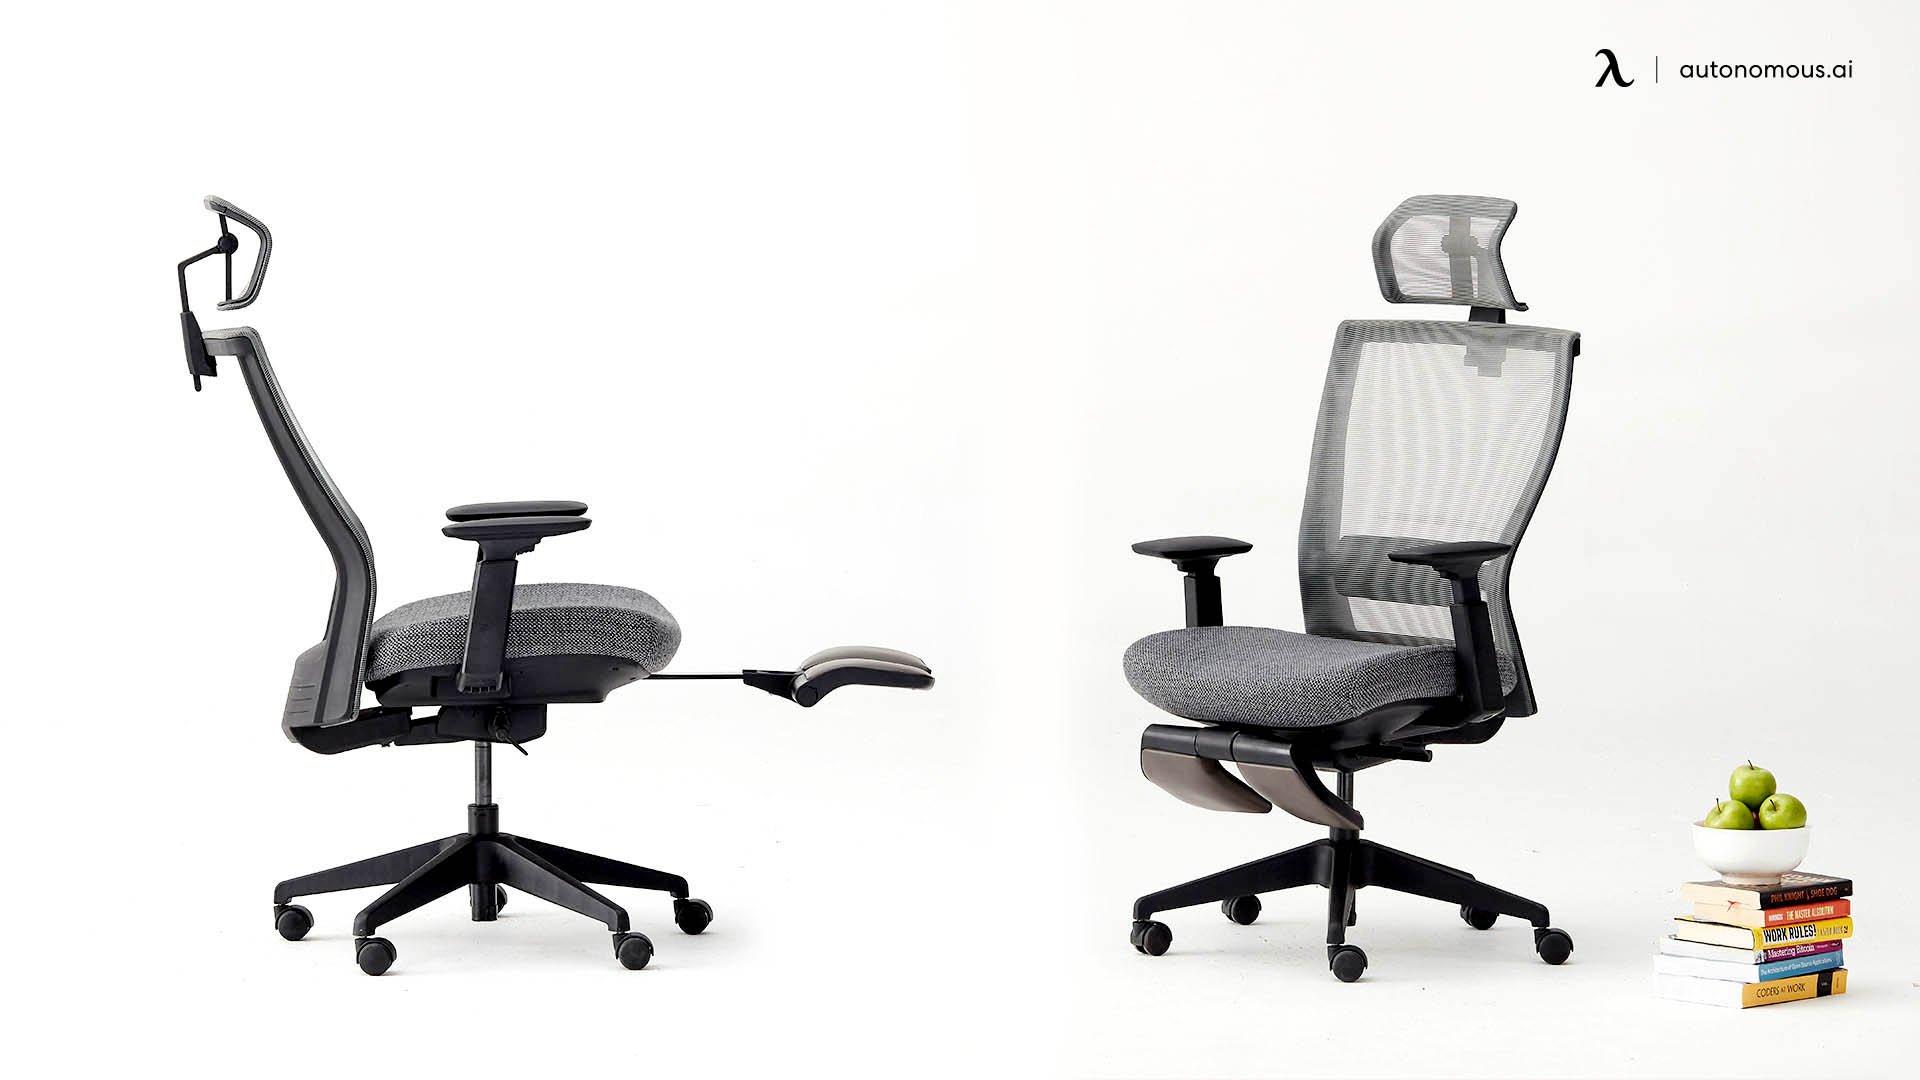 Autonomous MyoChair - Best Heavy Duty Reclining Office Chair